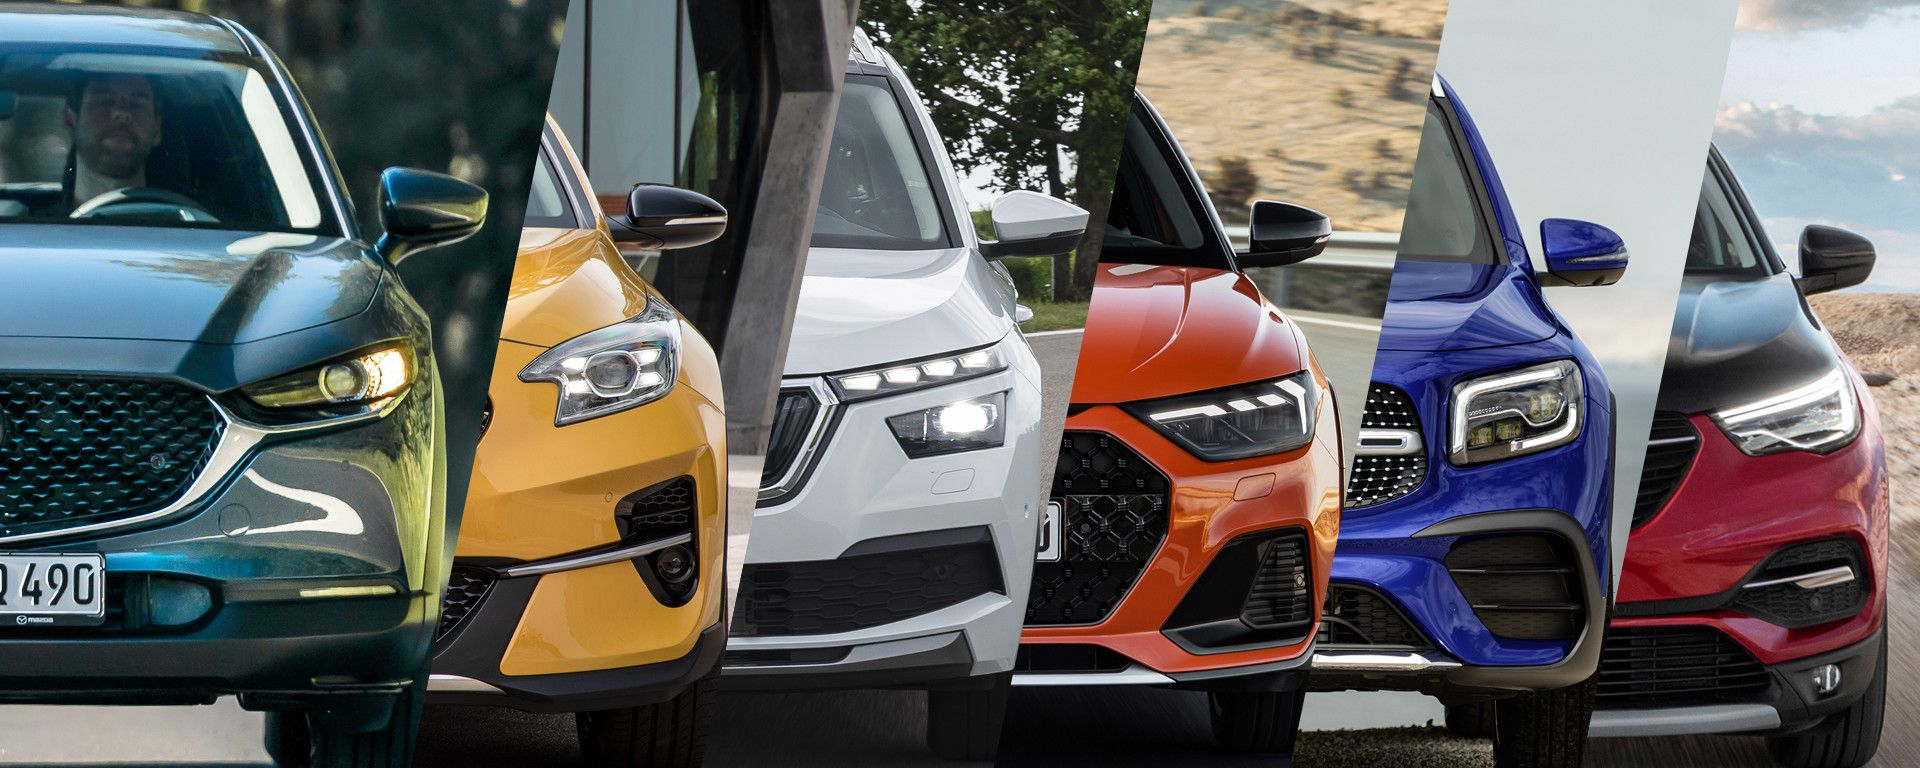 Mazda CX-30, Kia Xceed, Skoda Kamiq, Audi A1 Citycarver, Mercedes GLB, Opel Grandland X Hybrid4